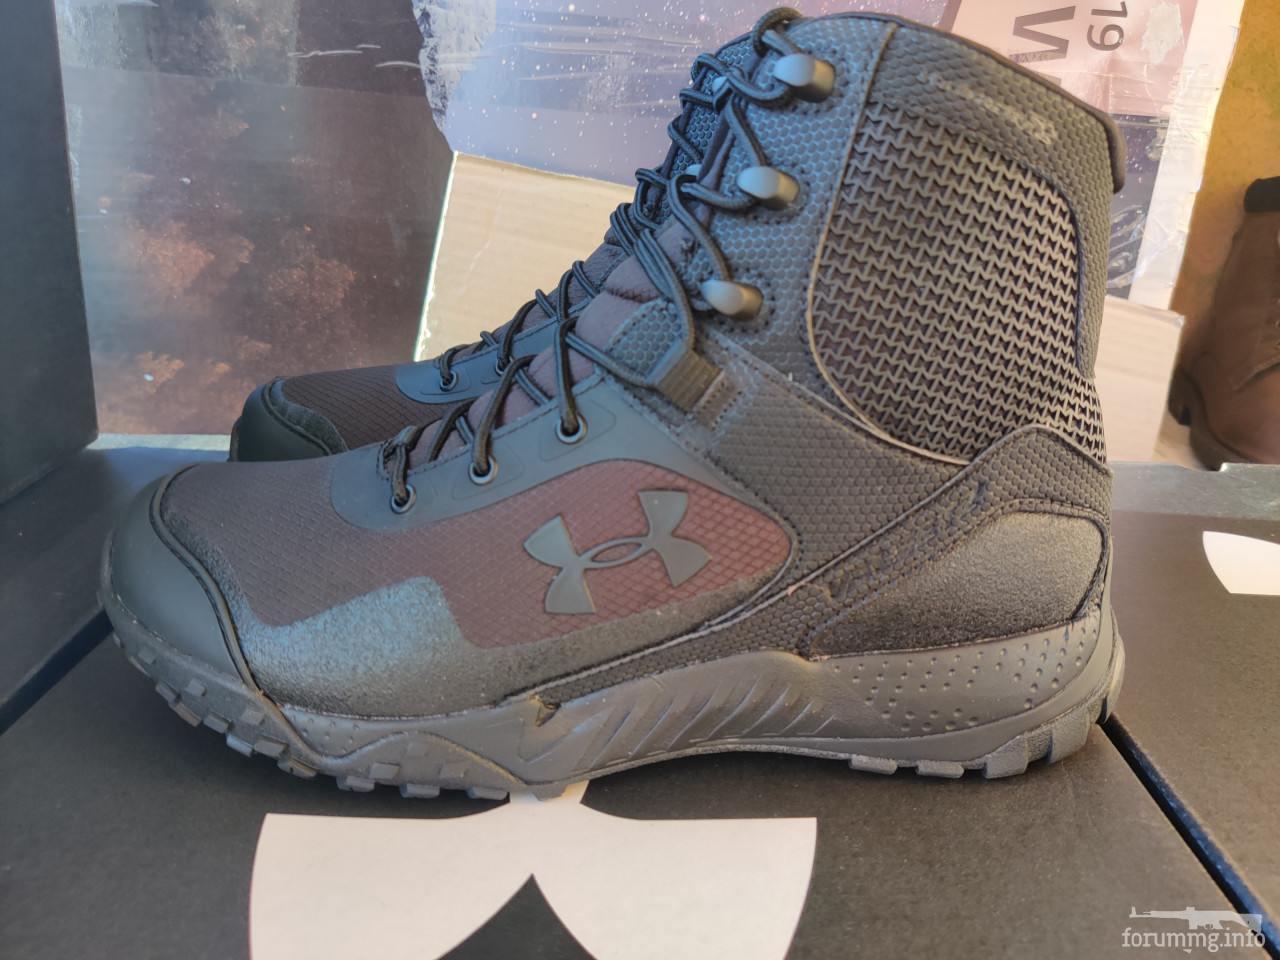 138691 - Under Armour Valsetz Boots (Under Armour Tactical Boots) 40-47р